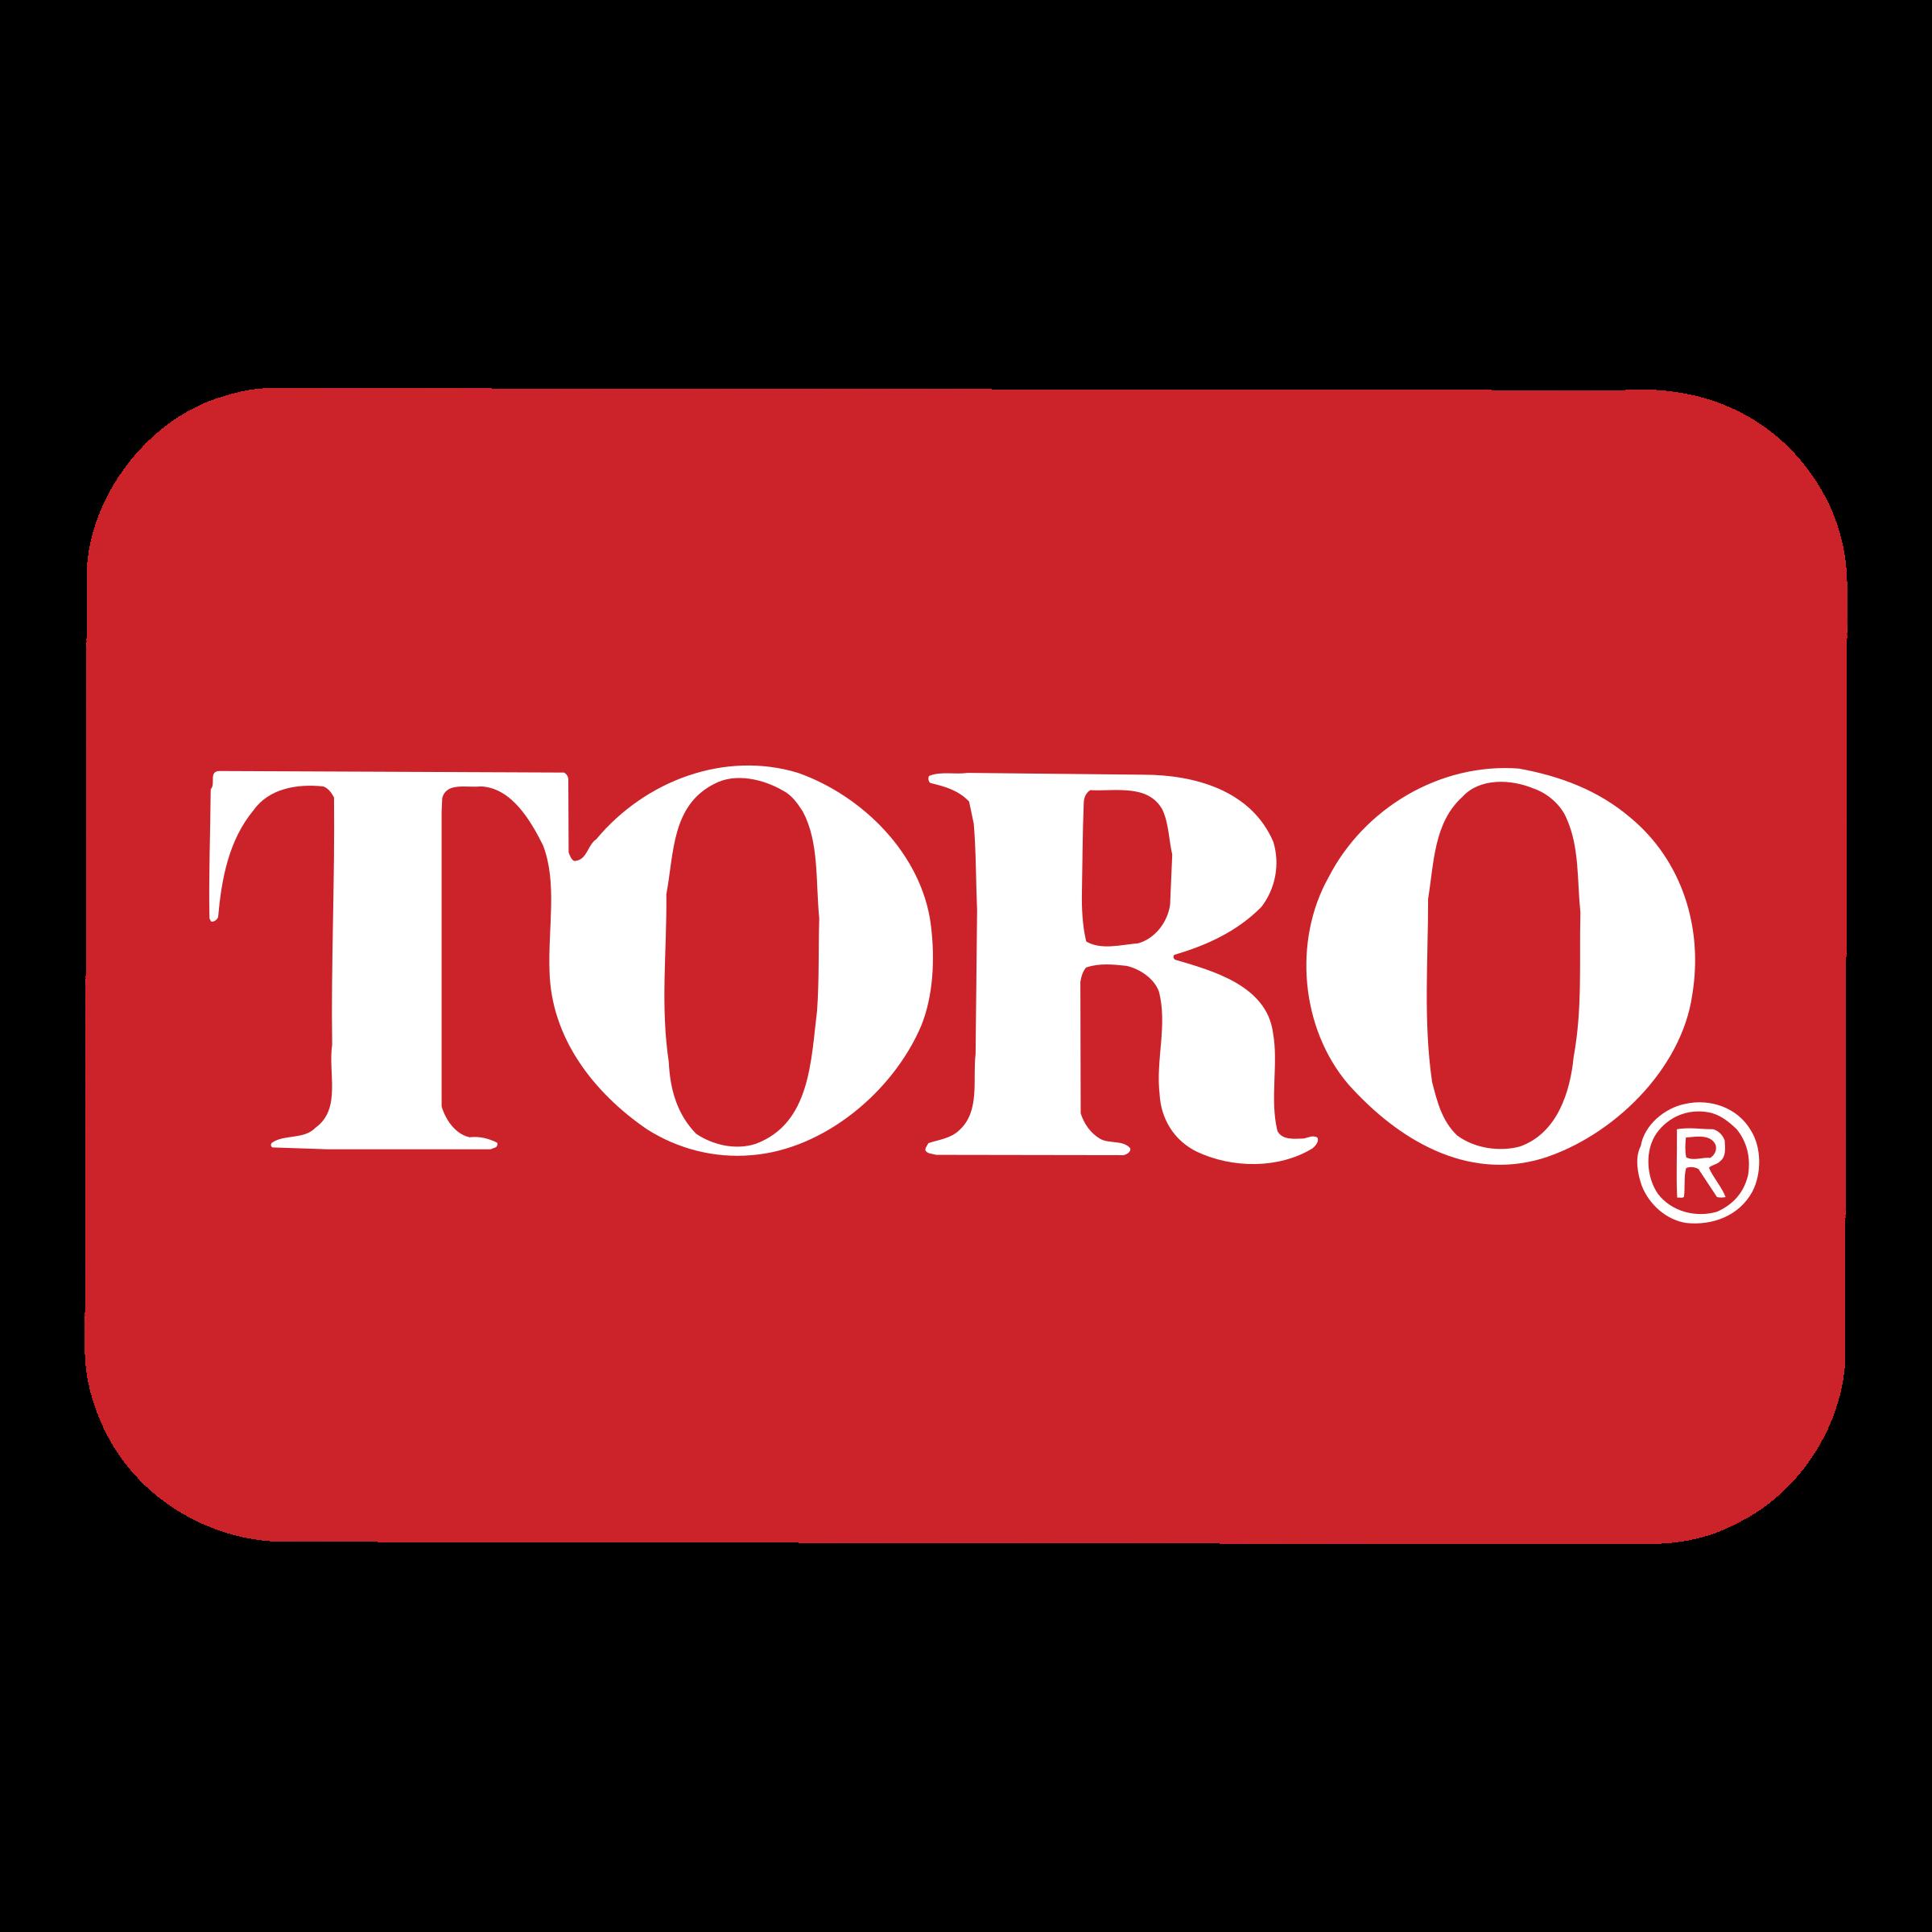 Toro's Logo